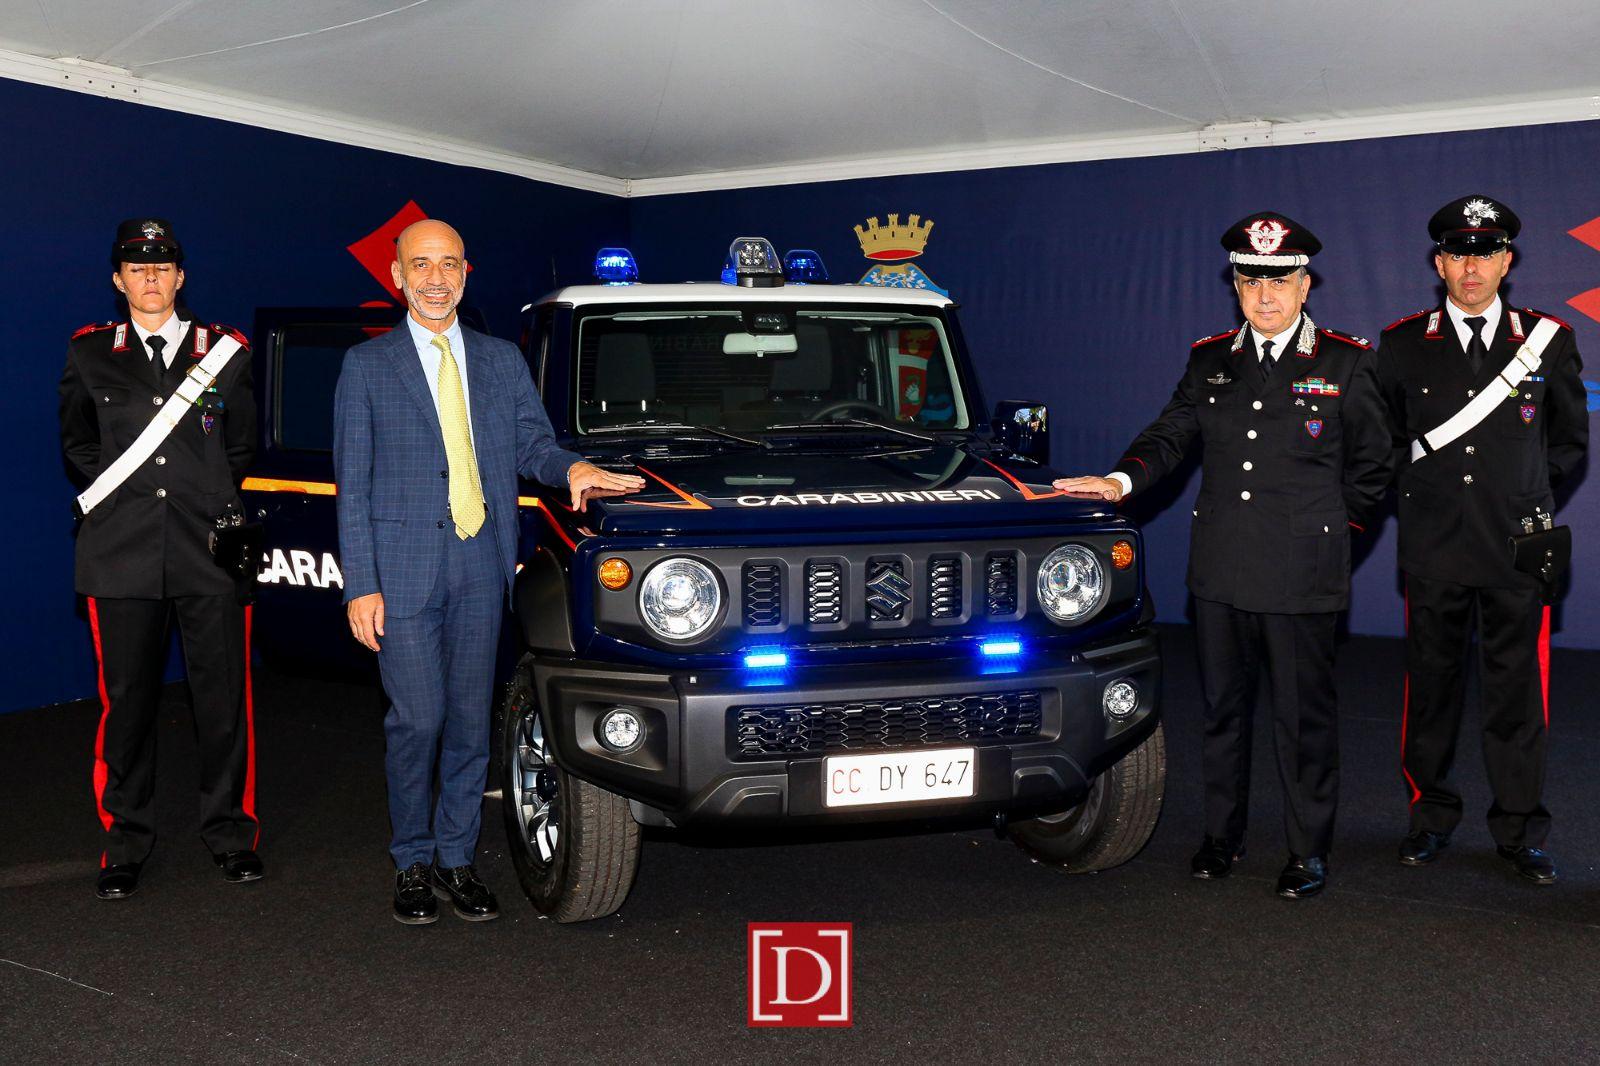 2019-10-23-suzuki-carabinieri-8994